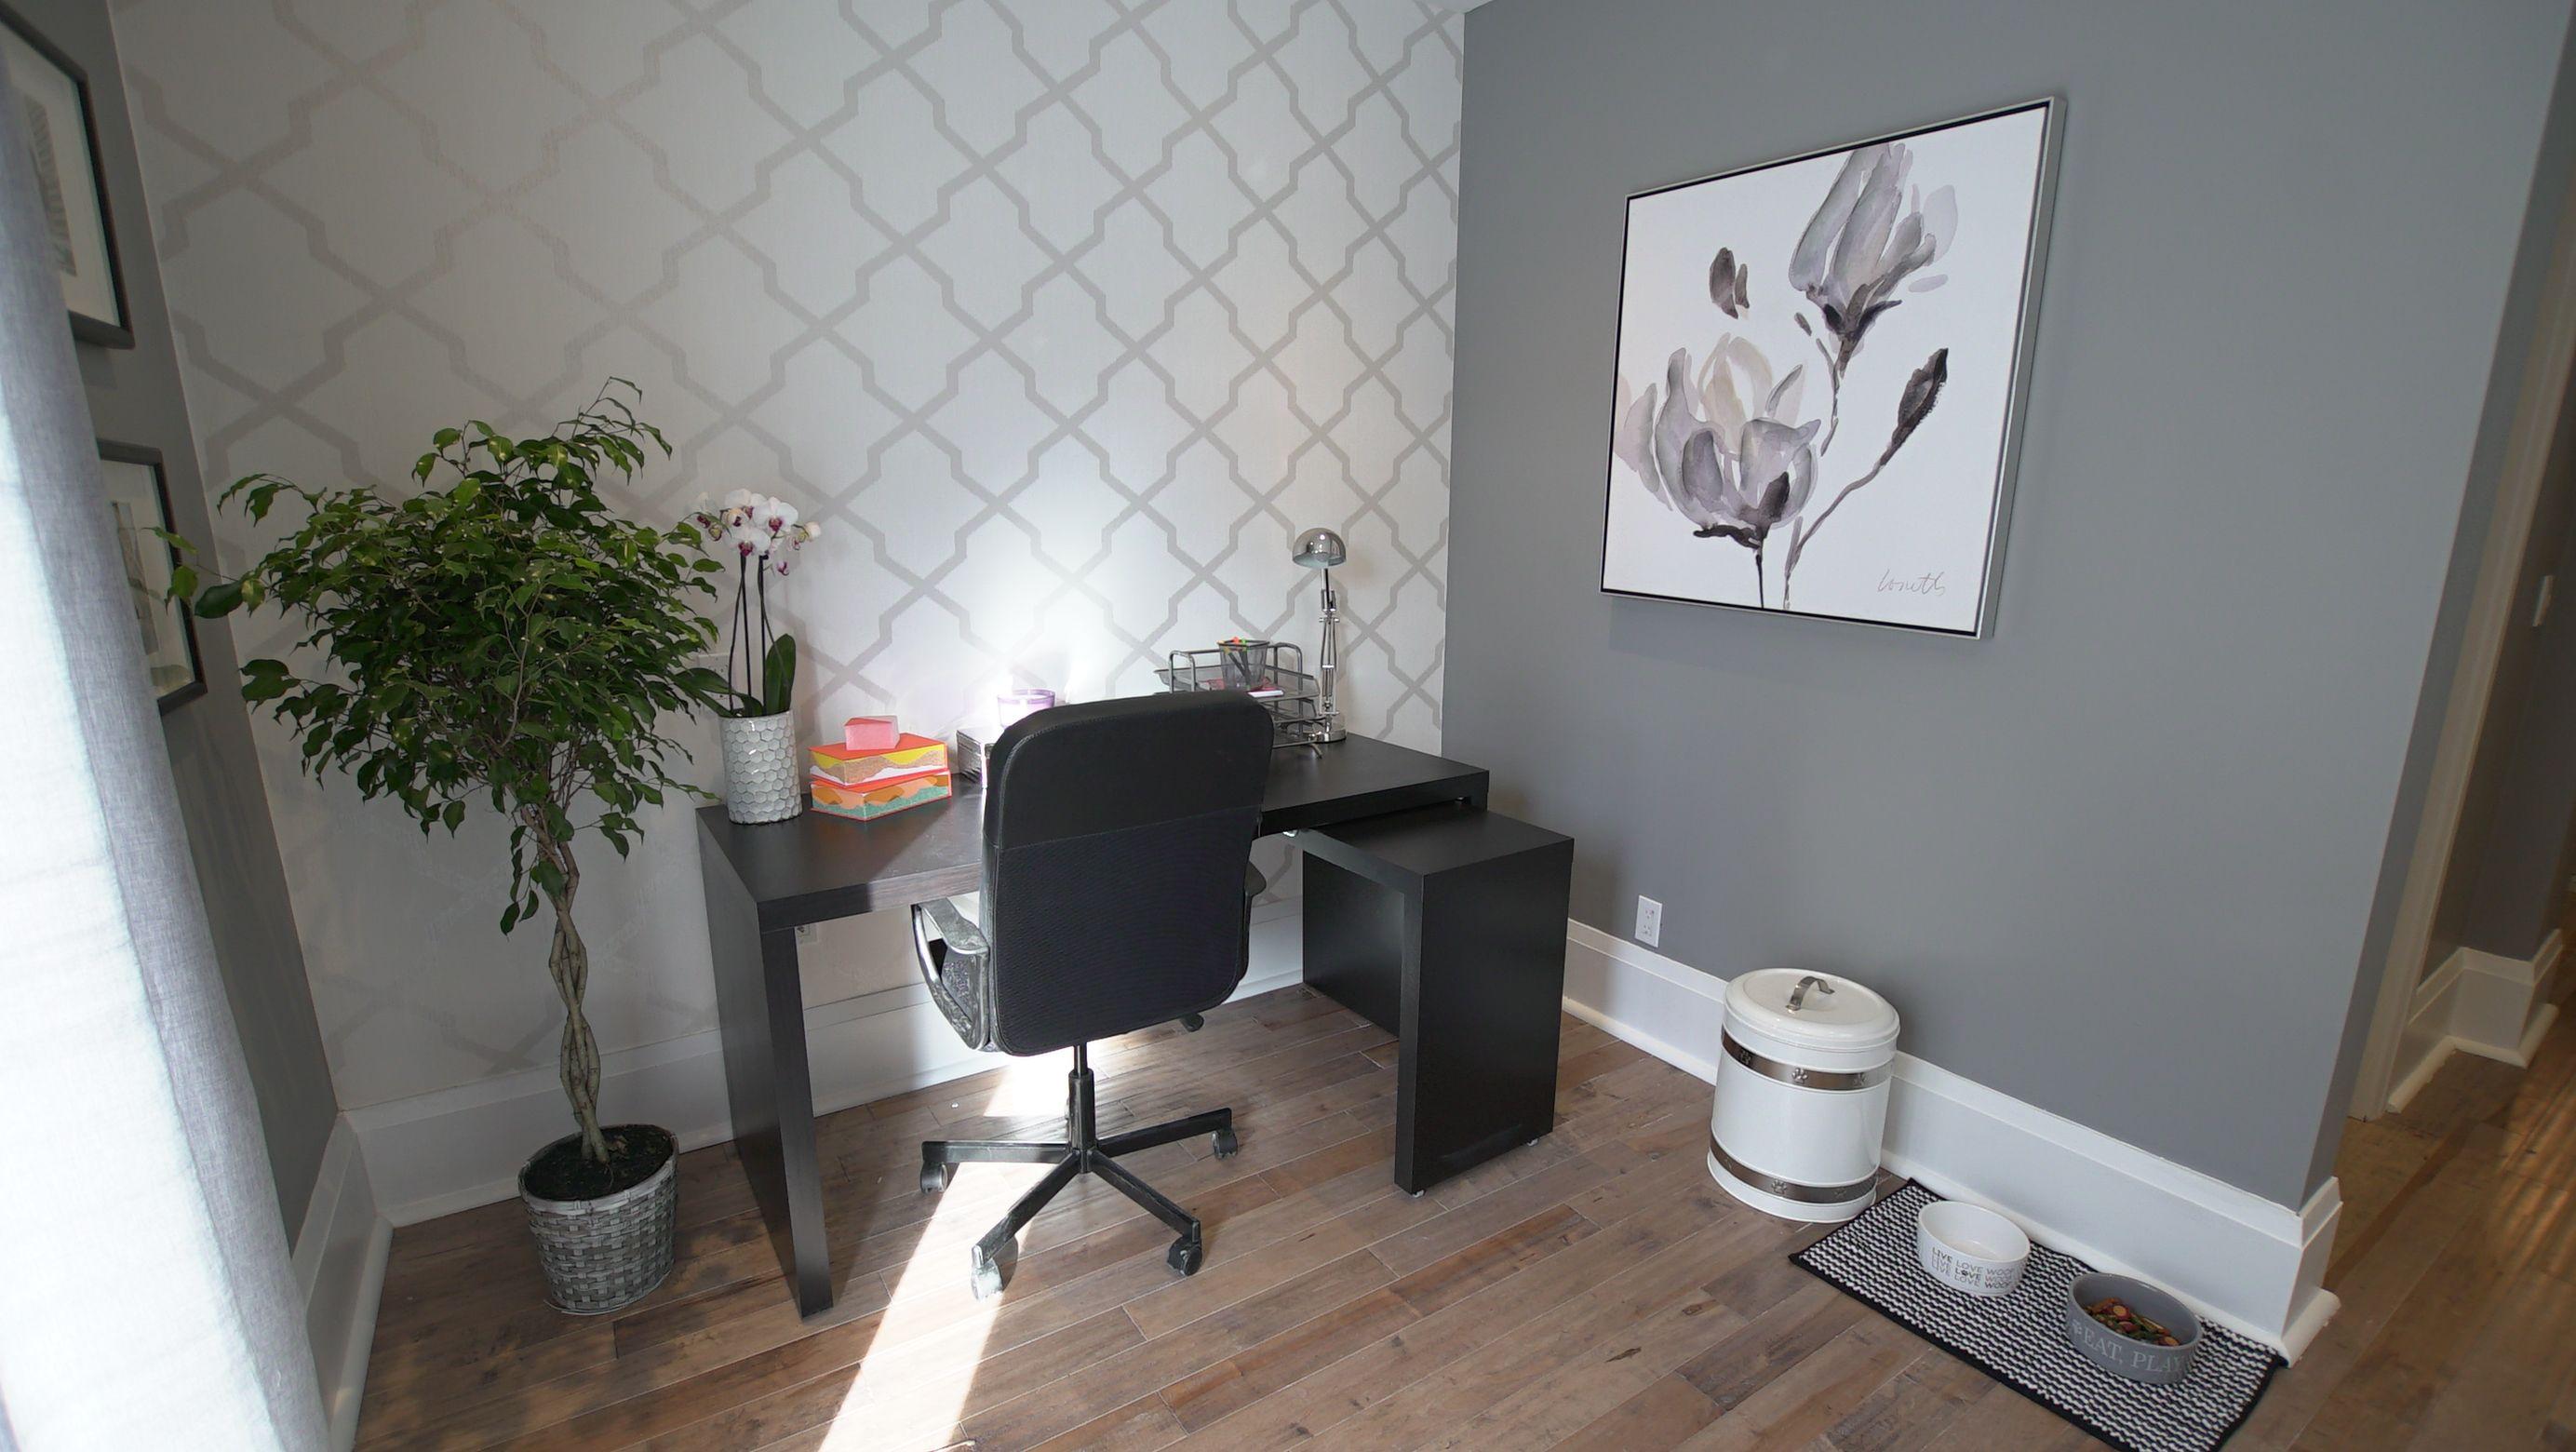 Office Master Bedroom Ideas Pinterest Property Brothers - Property brothers bedroom designs